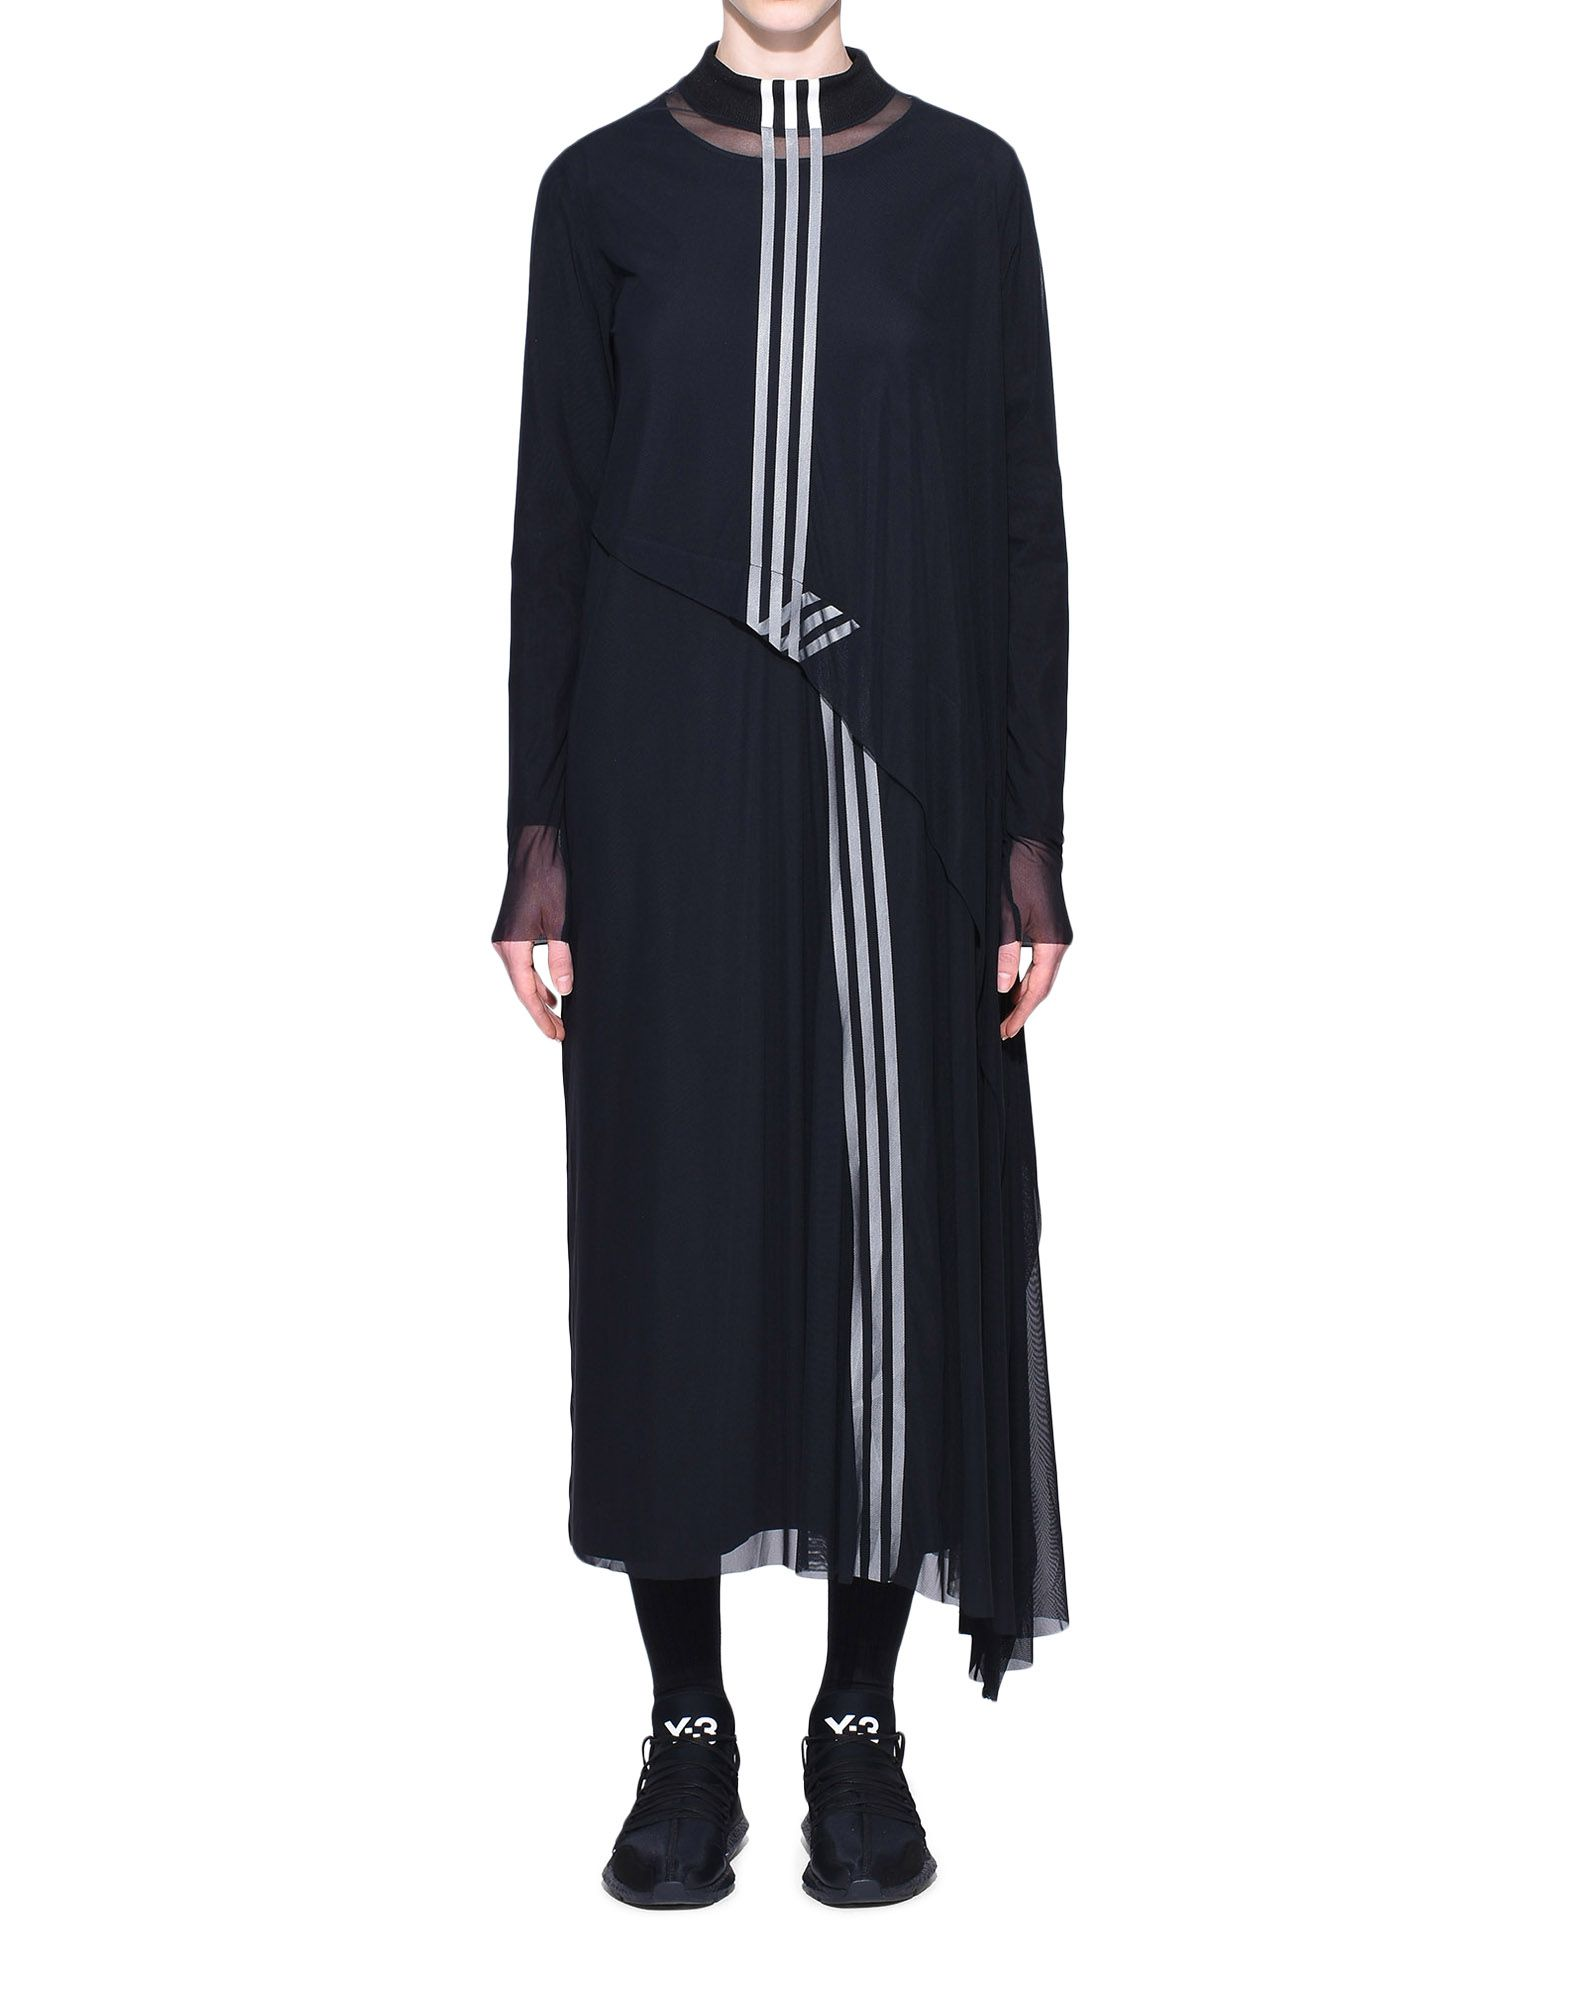 Y-3 Y-3 3-Stripes Mesh Dress Длинное платье Для Женщин r